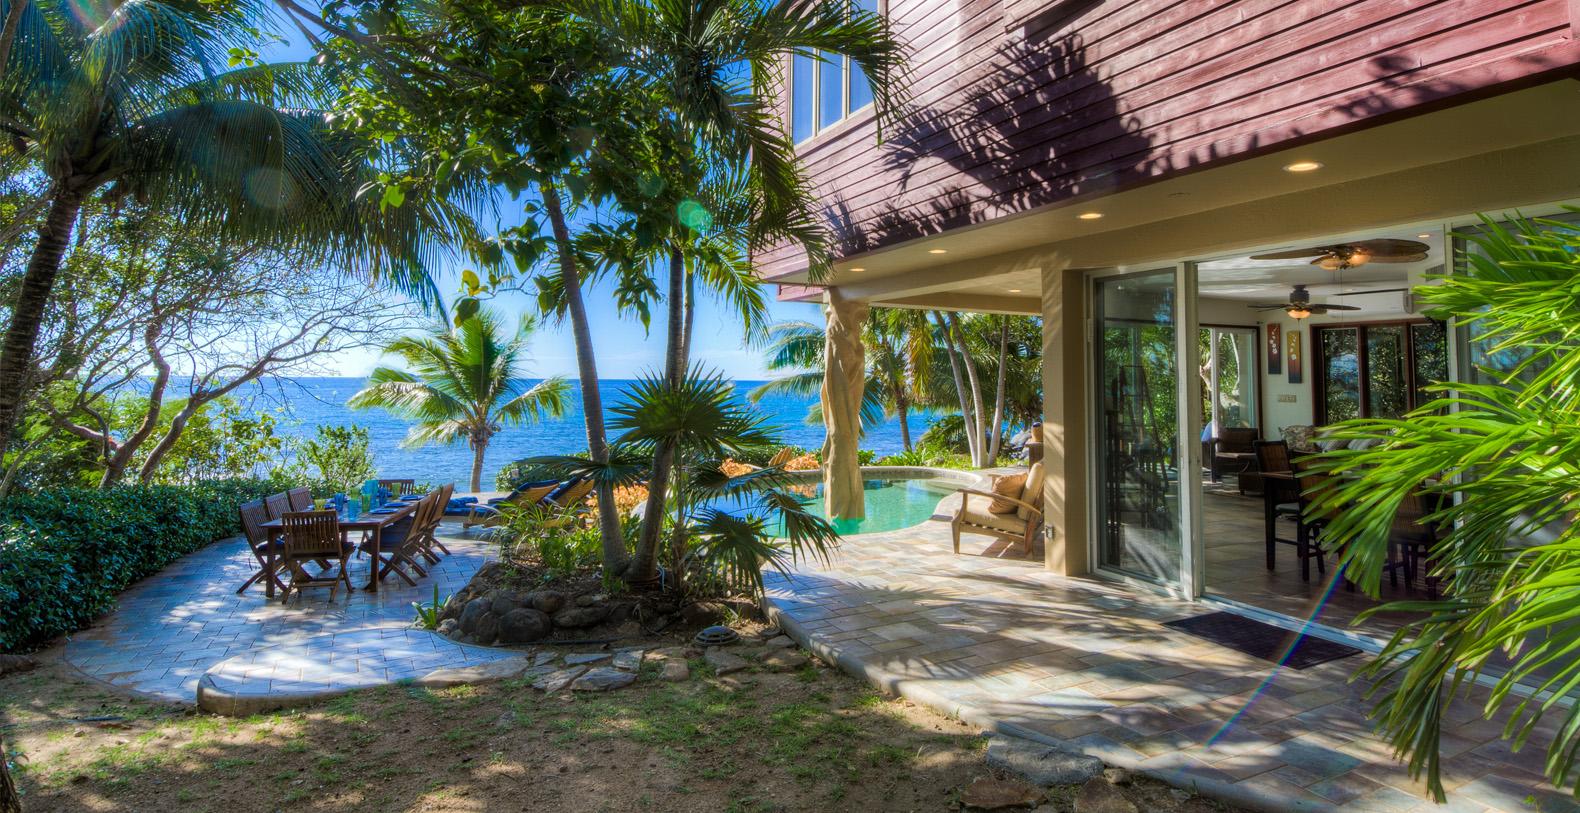 Rambutan Villa Virgin Gorda  Holiday Letting  Vacation